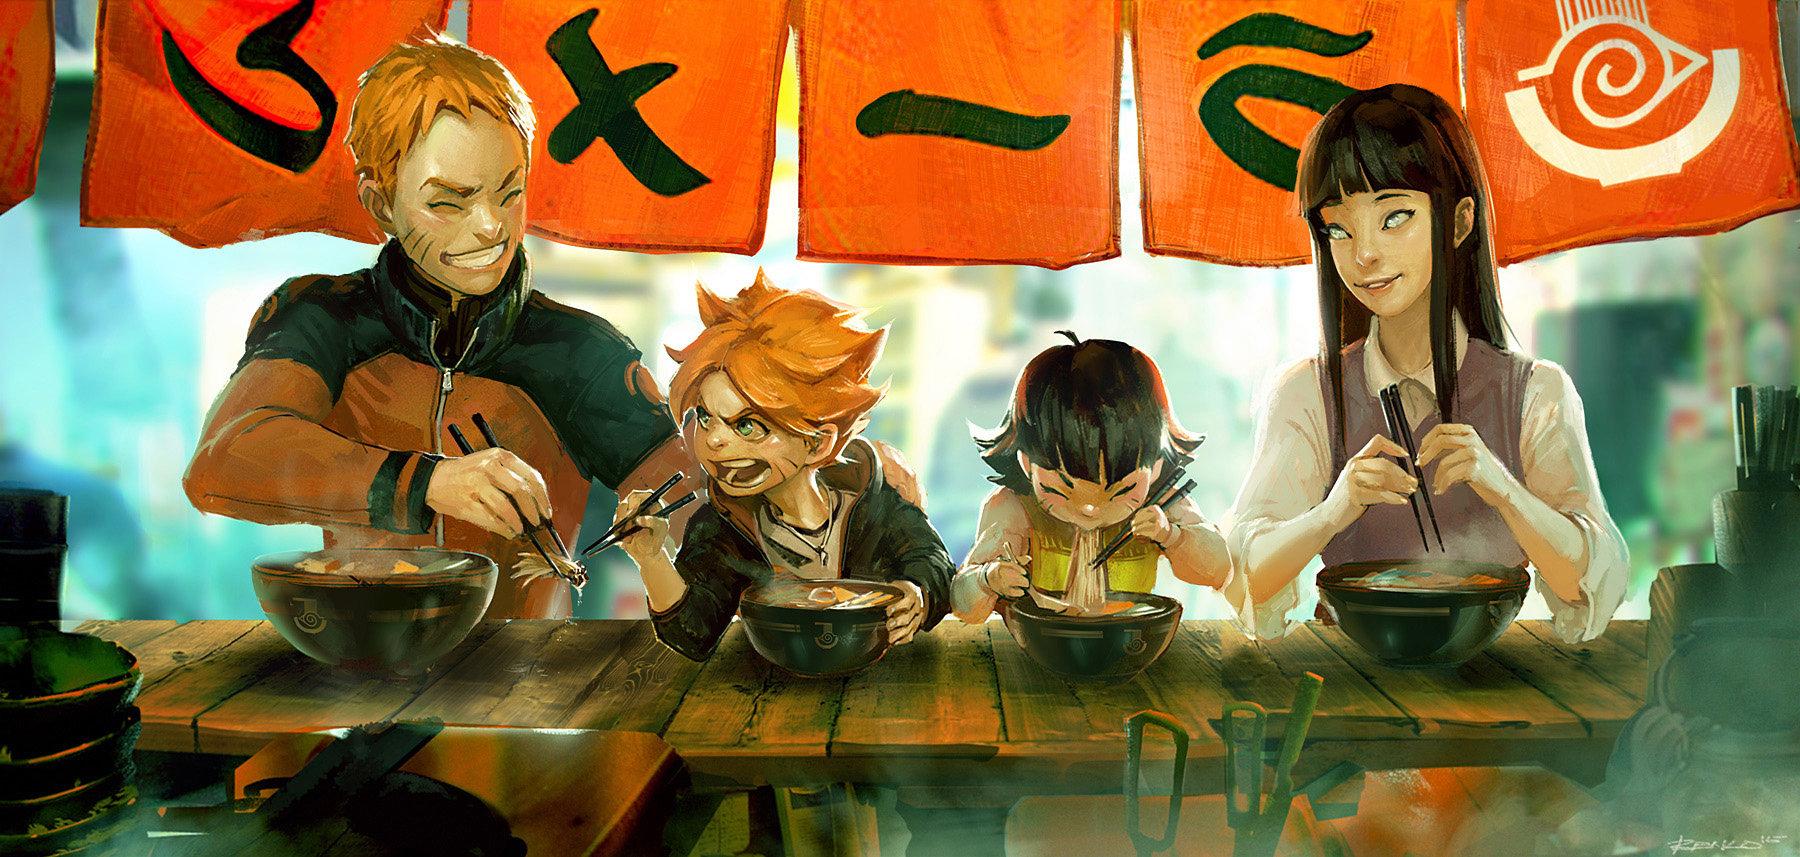 ArtStation - Naruto Fanart - Ramen Stand, Ben Lo